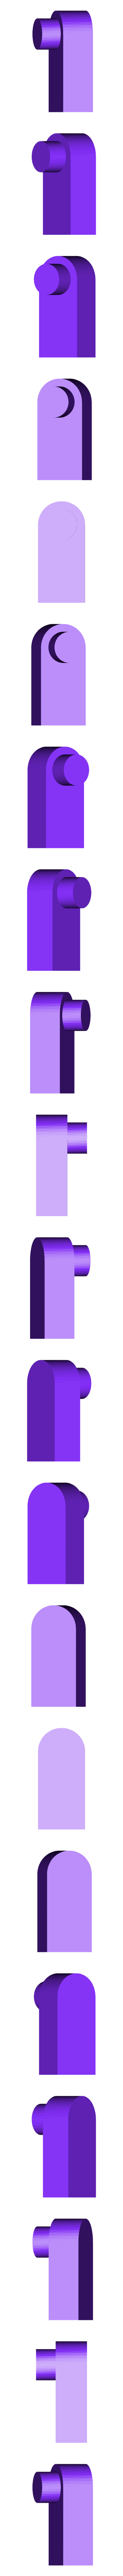 86Duino-Toilet-6.STL Download free STL file 86Duino Toilet • 3D printable object, 86Duino